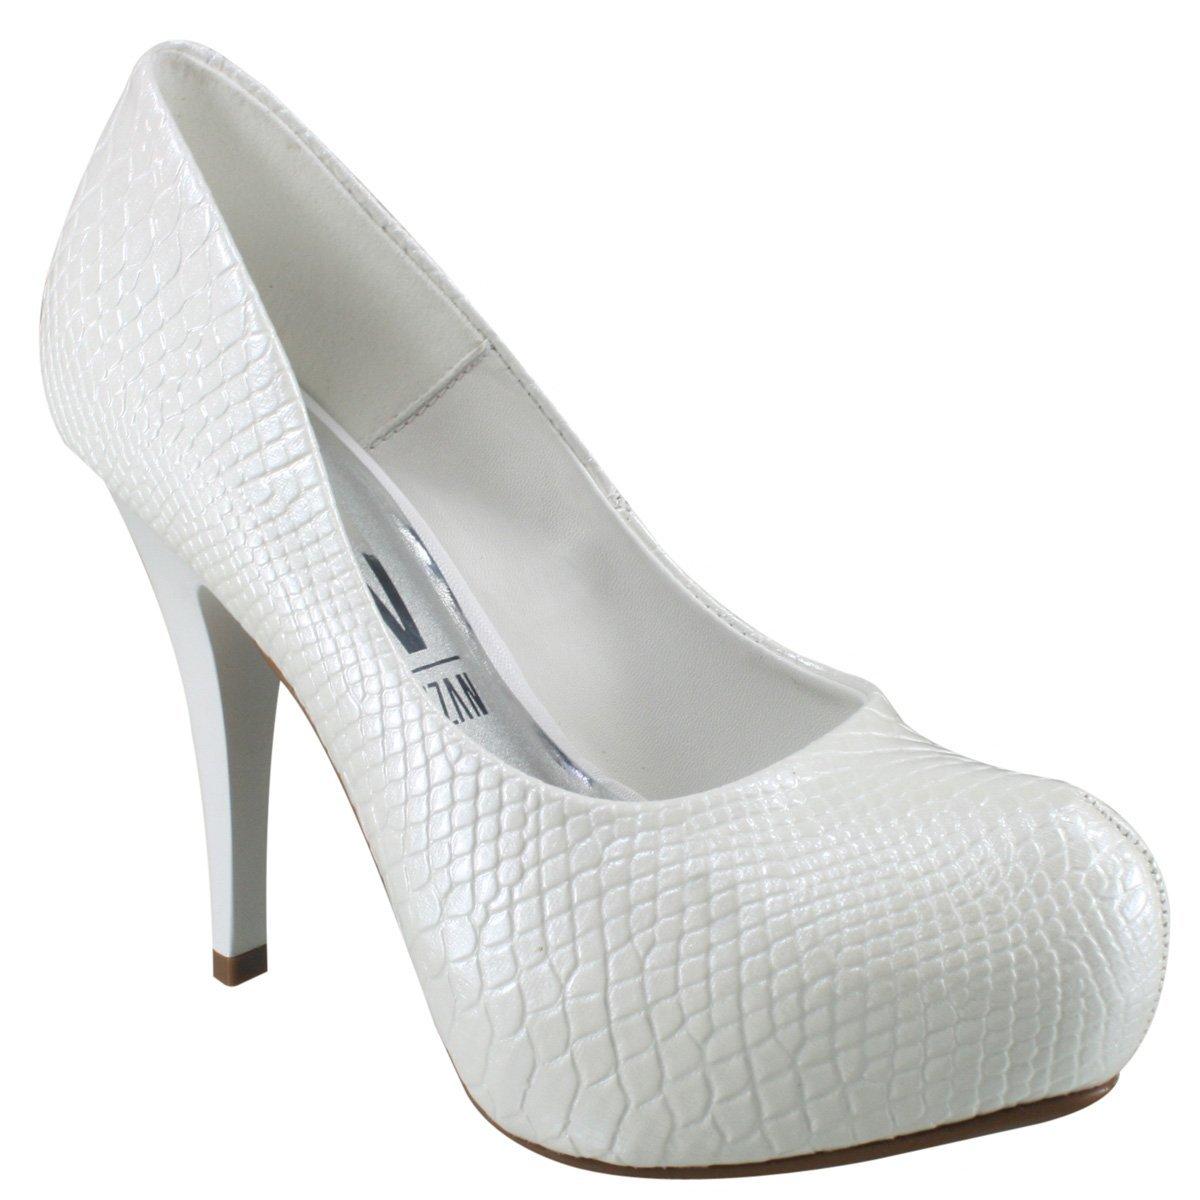 8f4c02abb Sapato Feminino Scarpin Noivas Vizzano Cobra Branco 1143809 1143809 ...